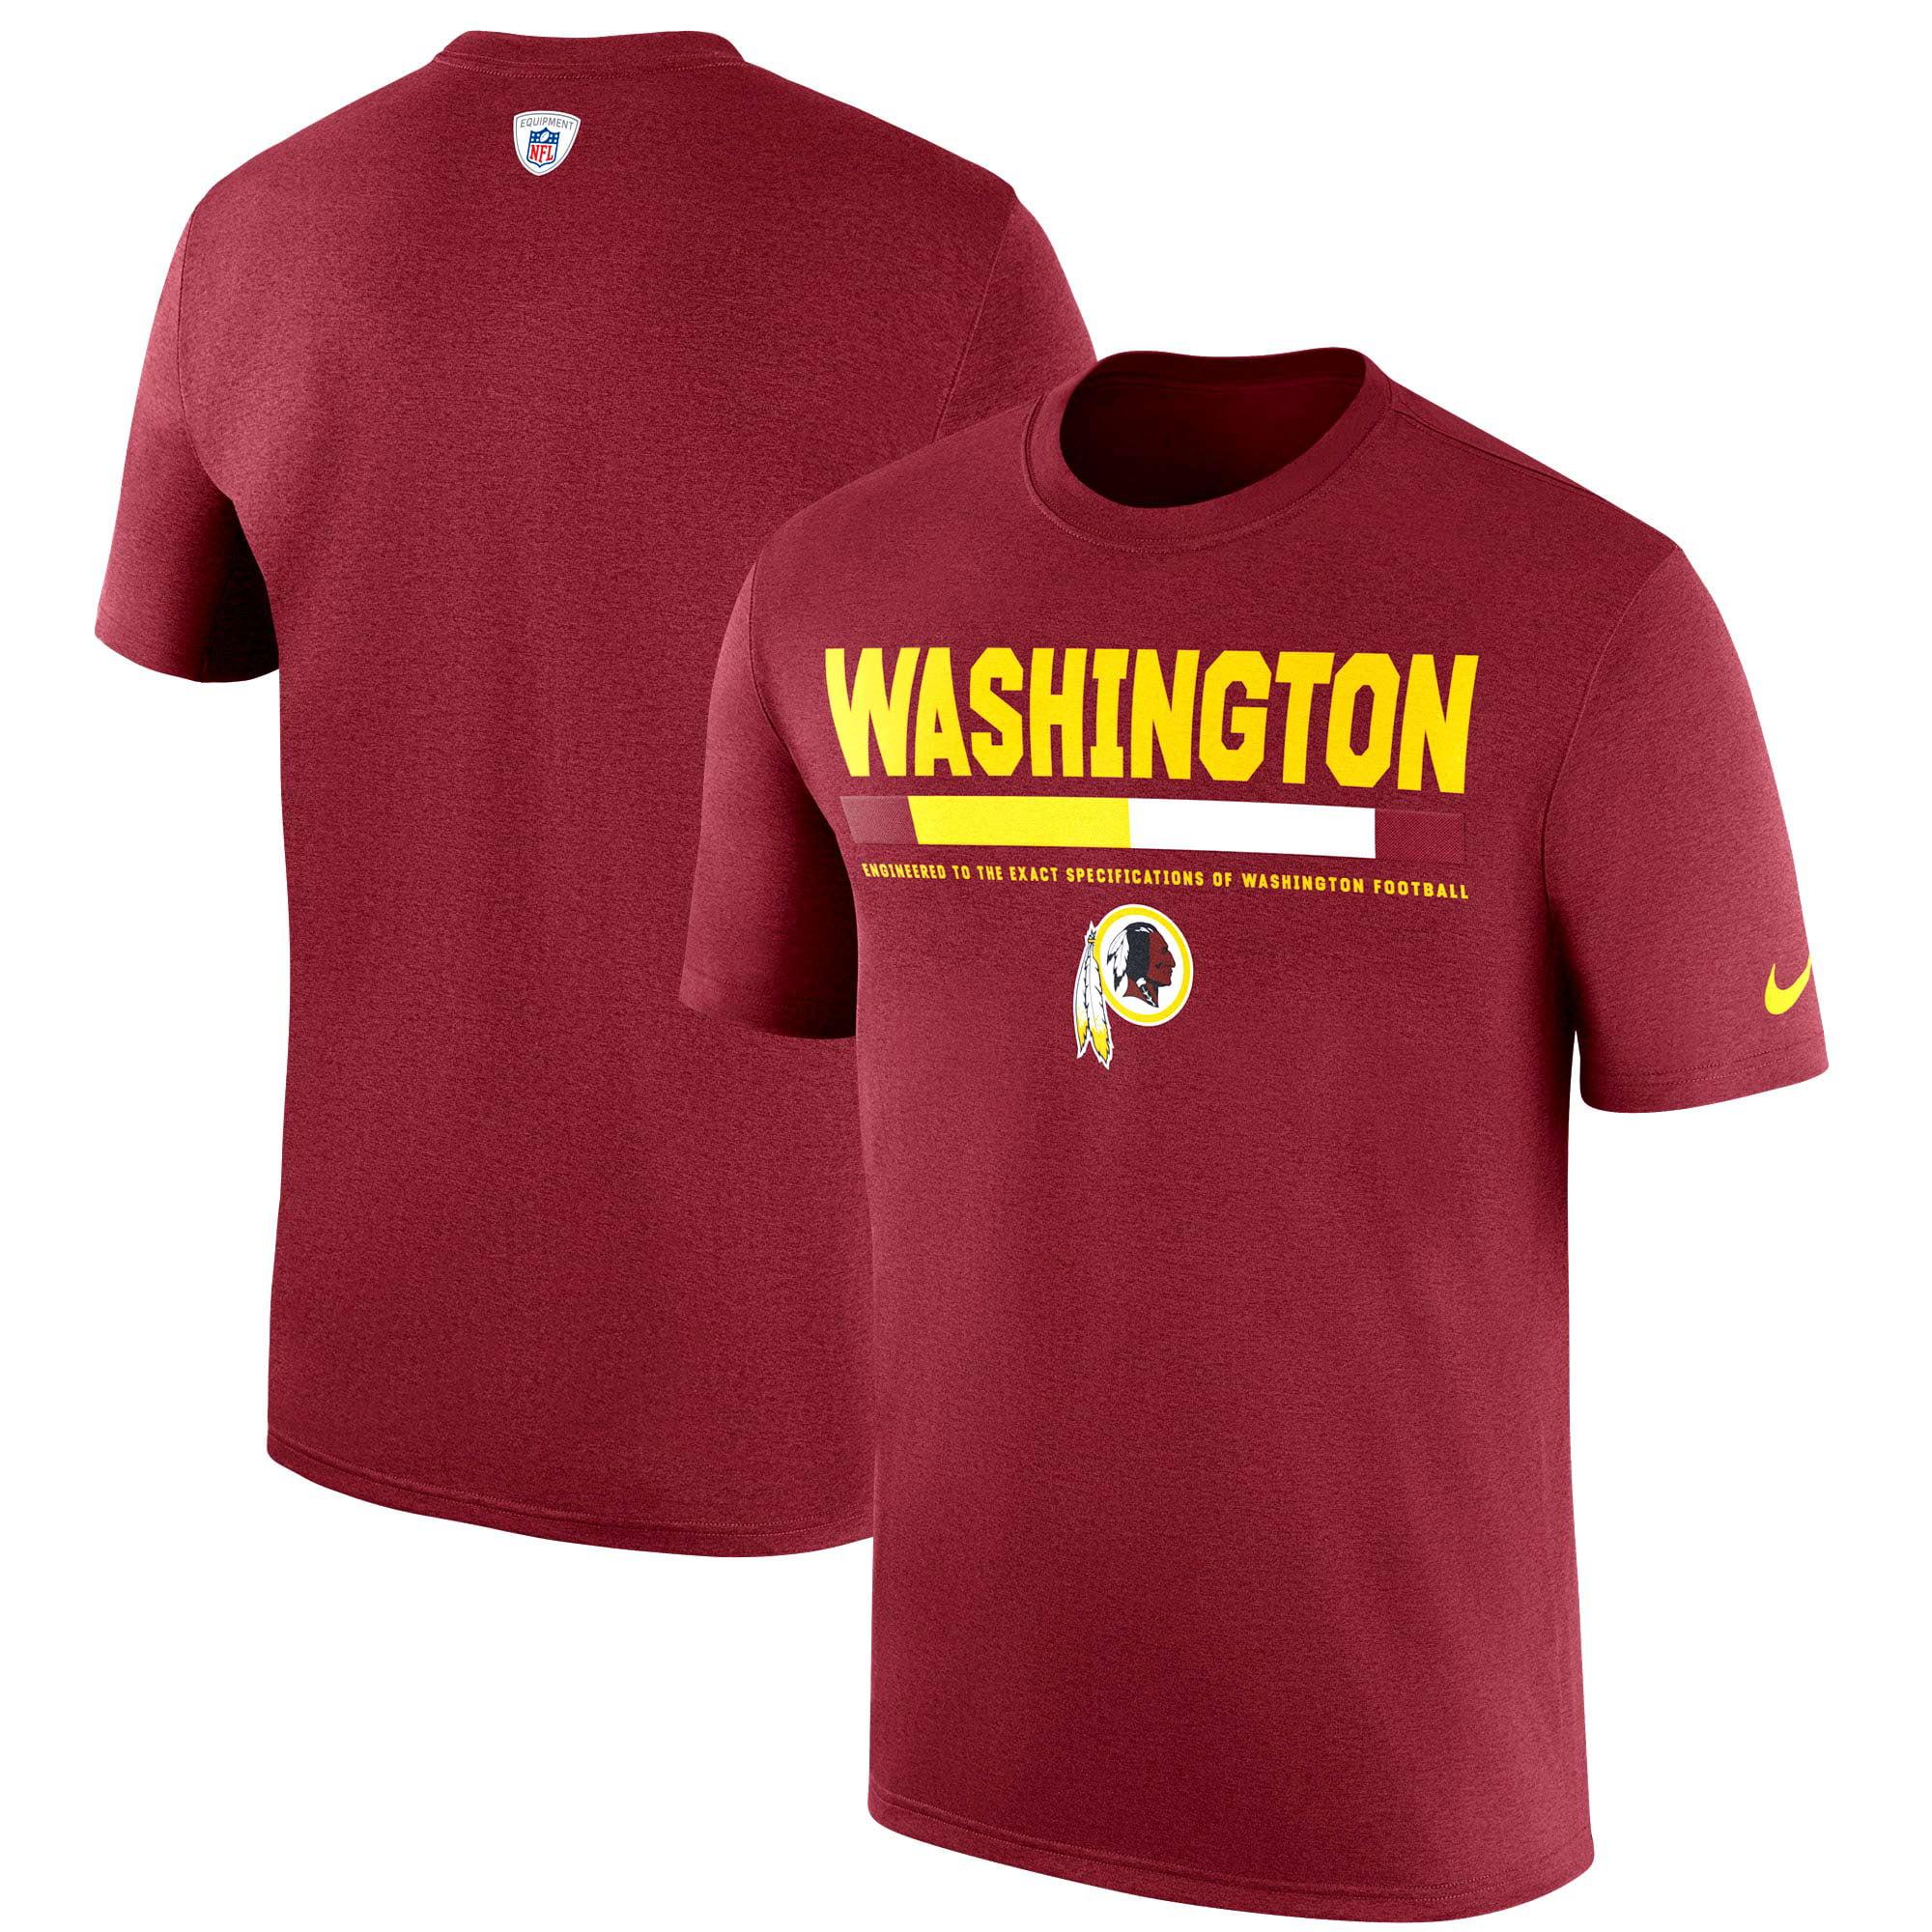 Washington Redskins Team Shop - Walmart.com 6ed2872c3f58f